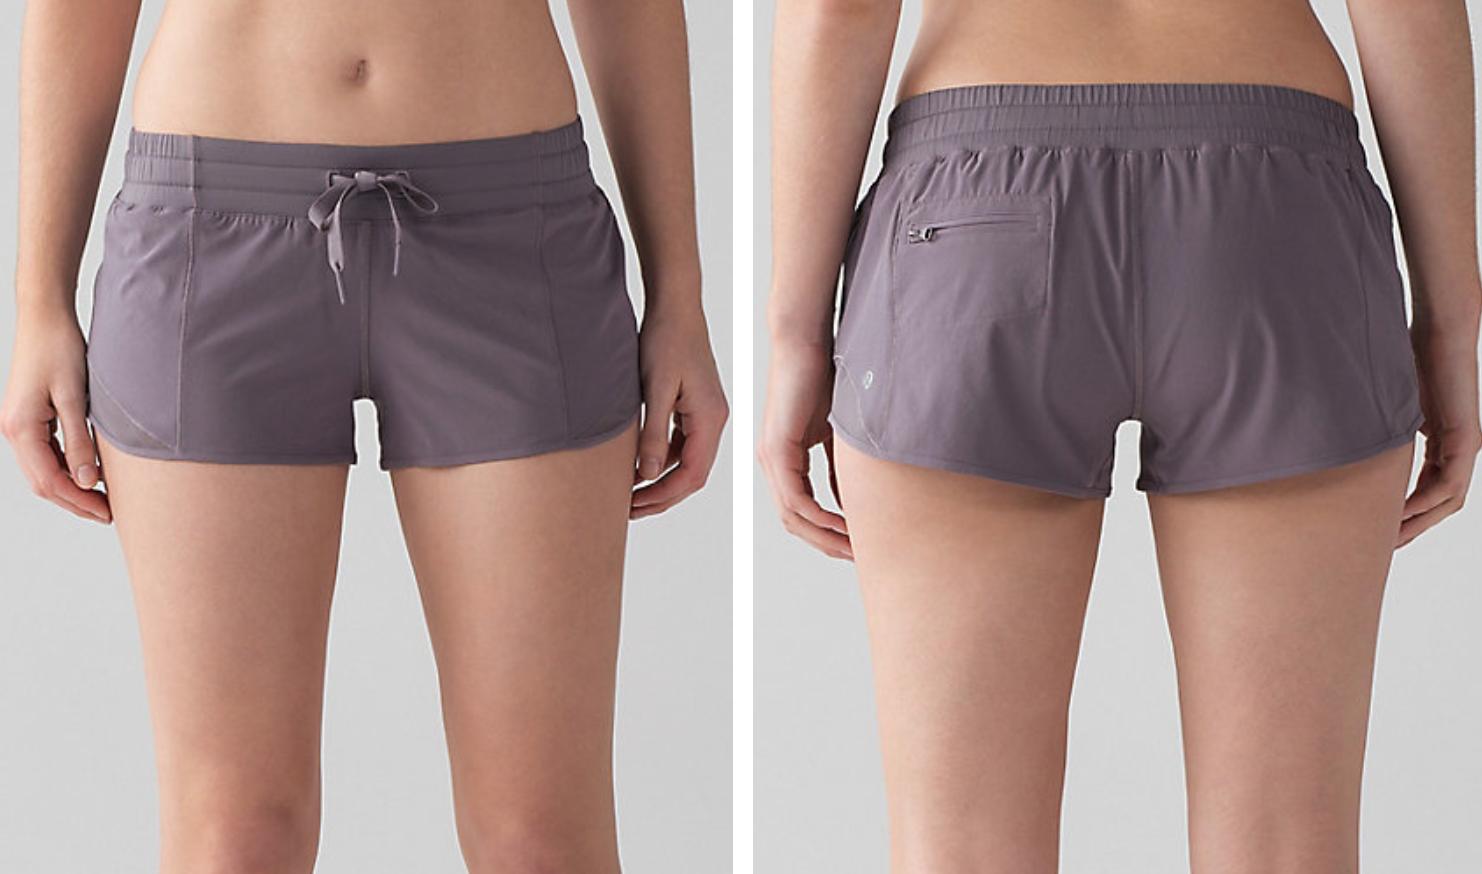 https://api.shopstyle.com/action/apiVisitRetailer?url=https%3A%2F%2Fshop.lululemon.com%2Fp%2Fwomen-shorts%2FHotty-Hot-Short%2F_%2Fprod3470302%3Frcnt%3D10%26N%3D809%26cnt%3D27%26color%3DLW7ACTR_028958&site=www.shopstyle.ca&pid=uid6784-25288972-7